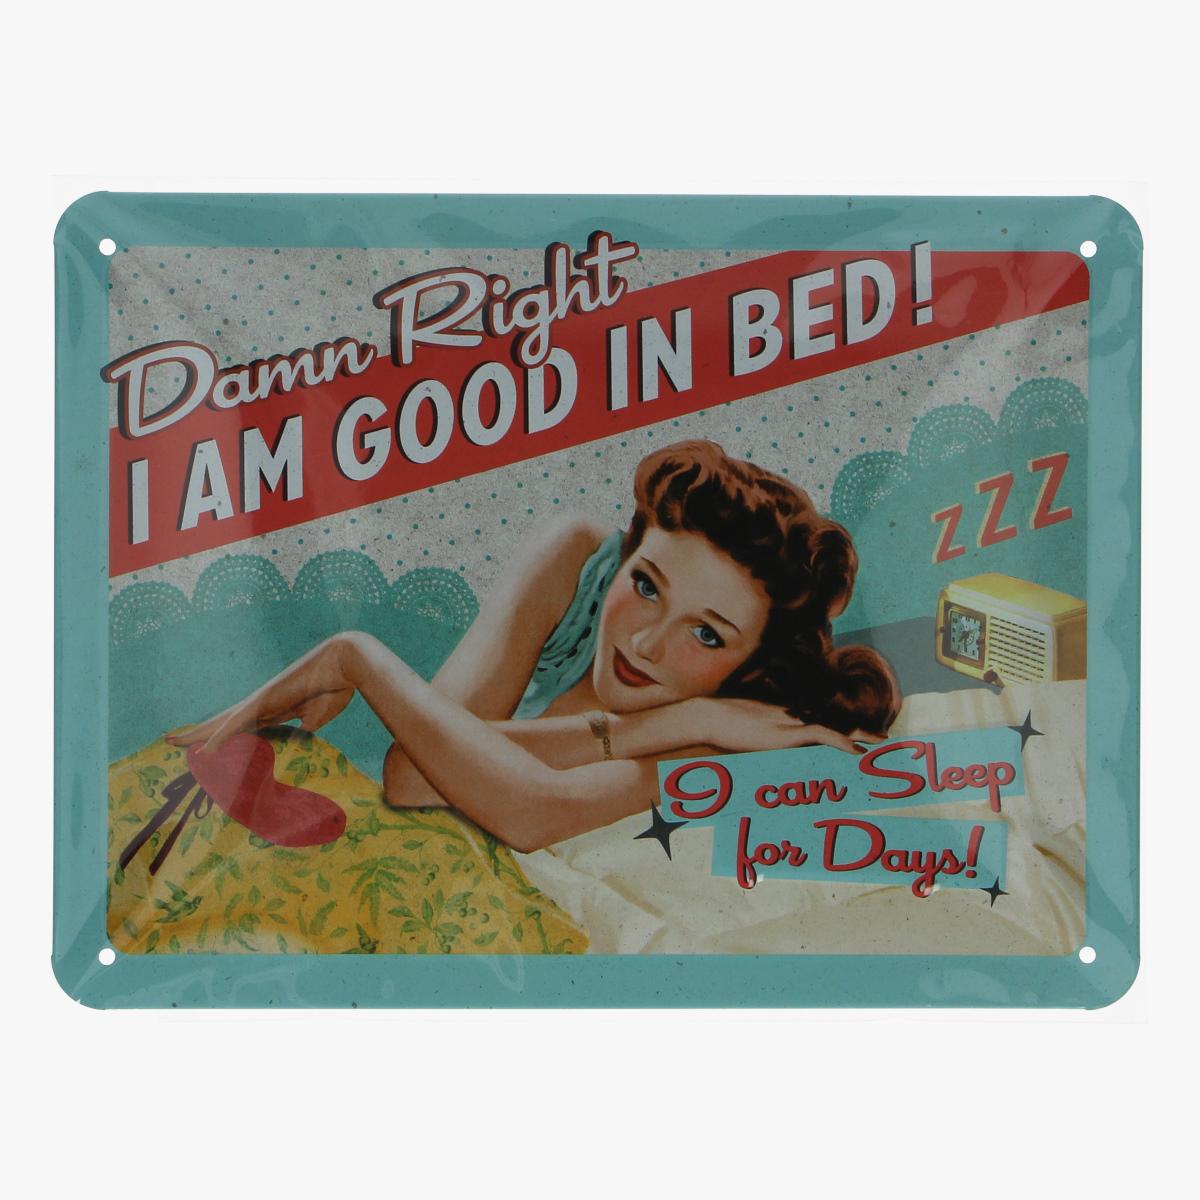 Afbeeldingen van blikken bordje damm right i am good in bed! repro